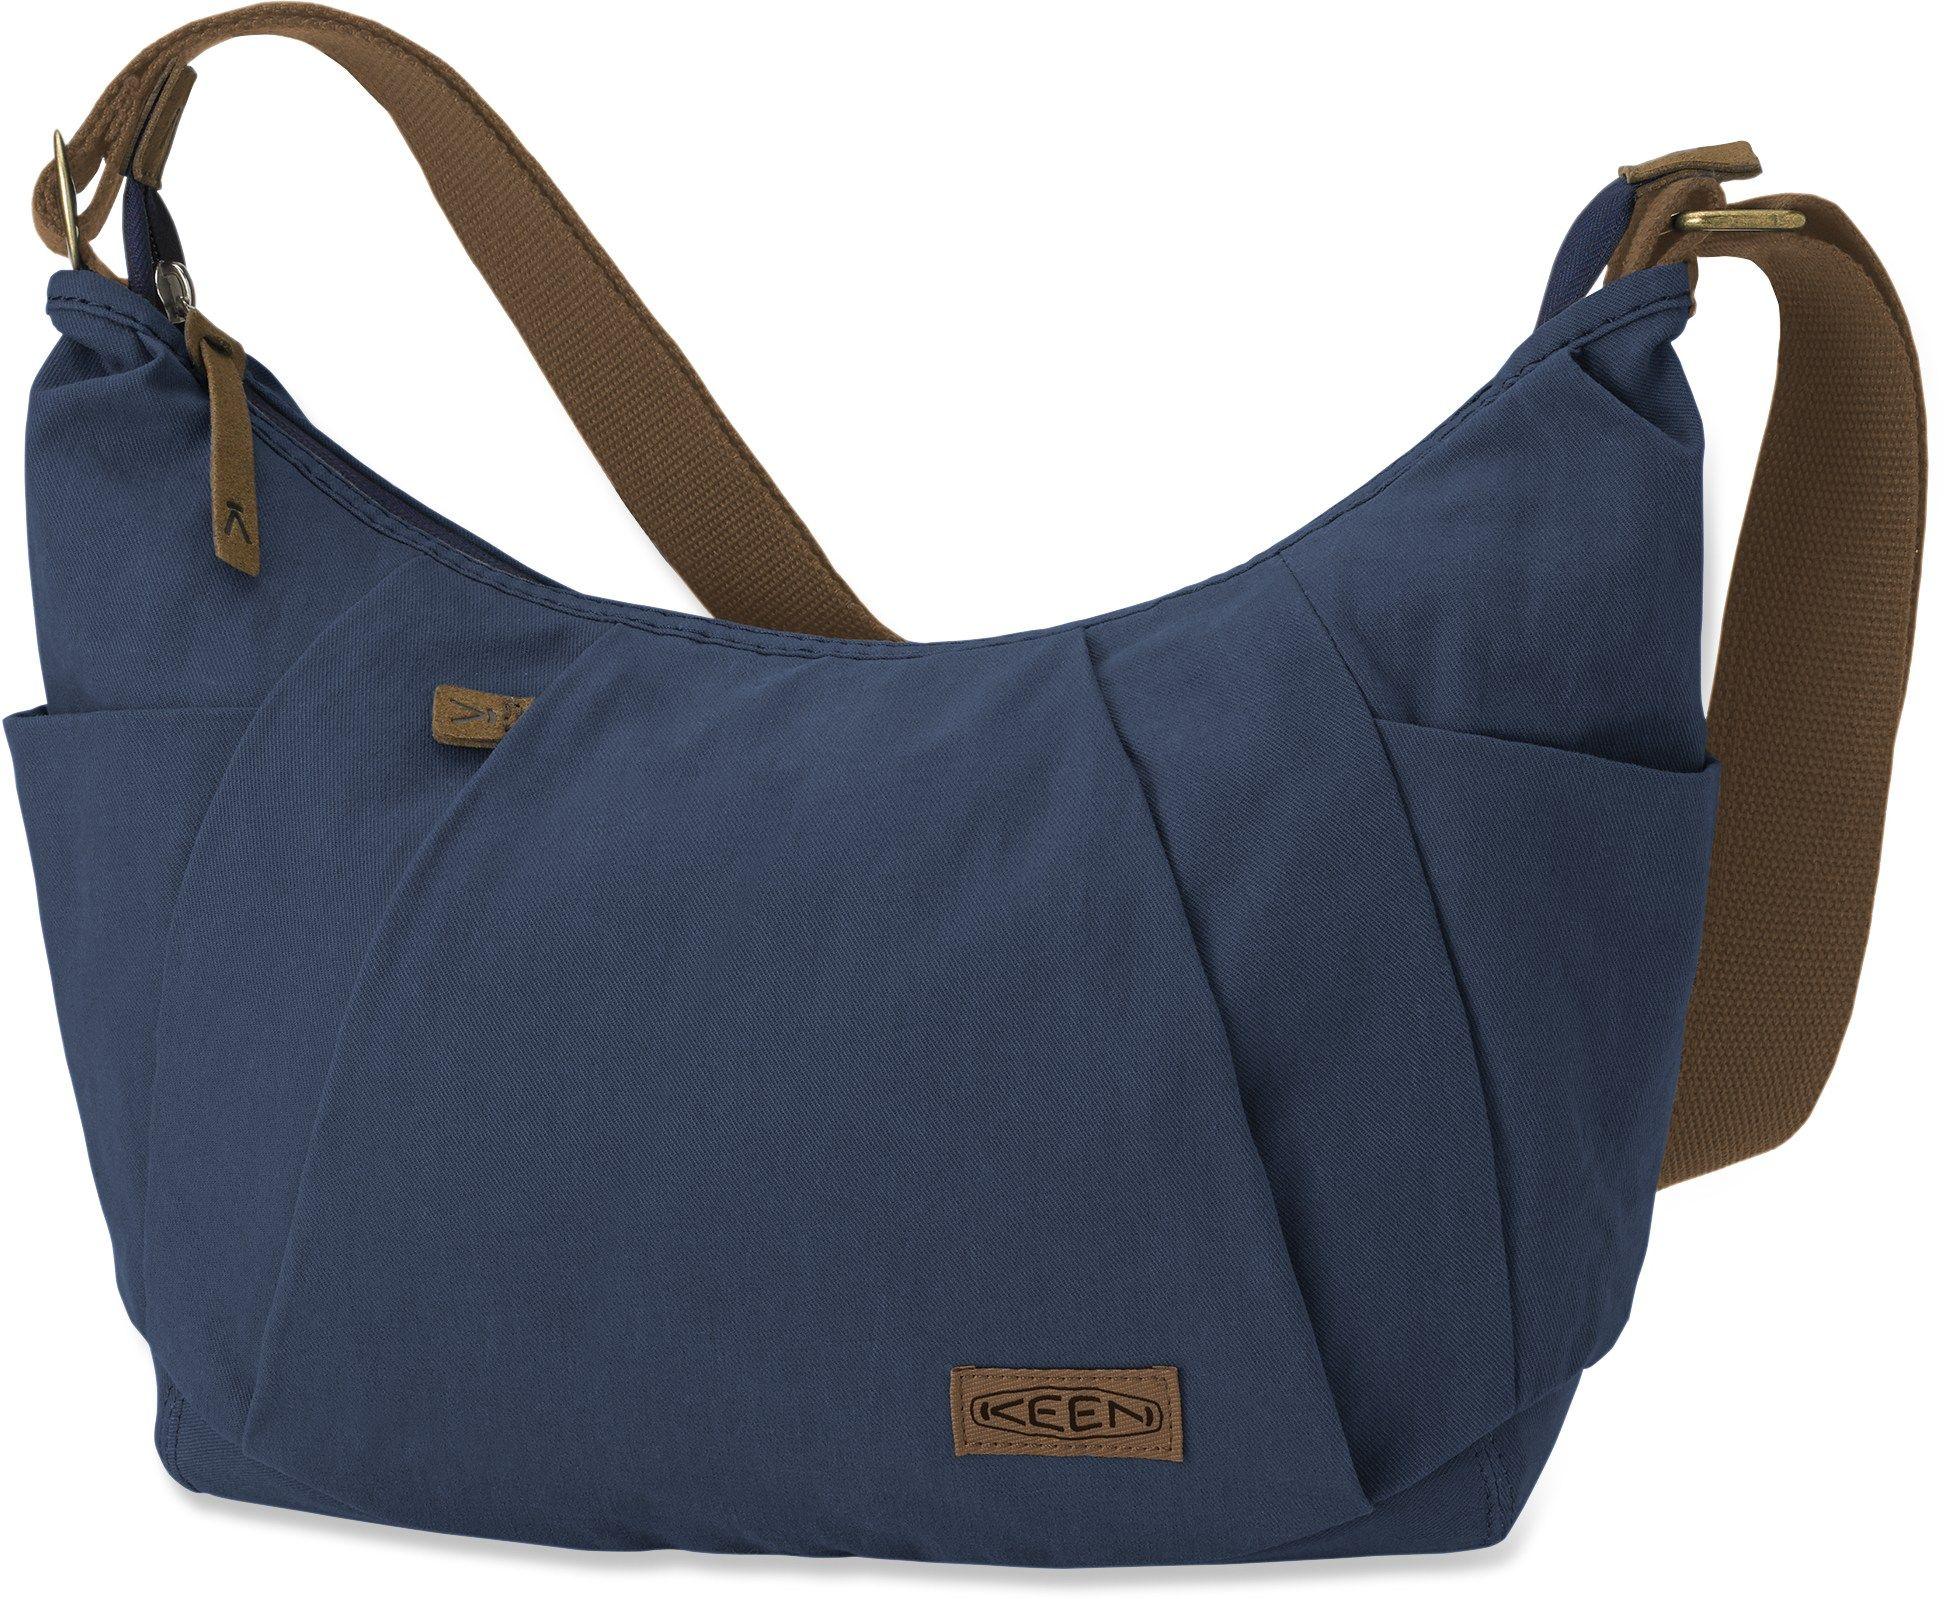 24a63fc0460 KEEN Westport Twill Shoulder Bag - Women's | REI Co-op | bags | Bags ...